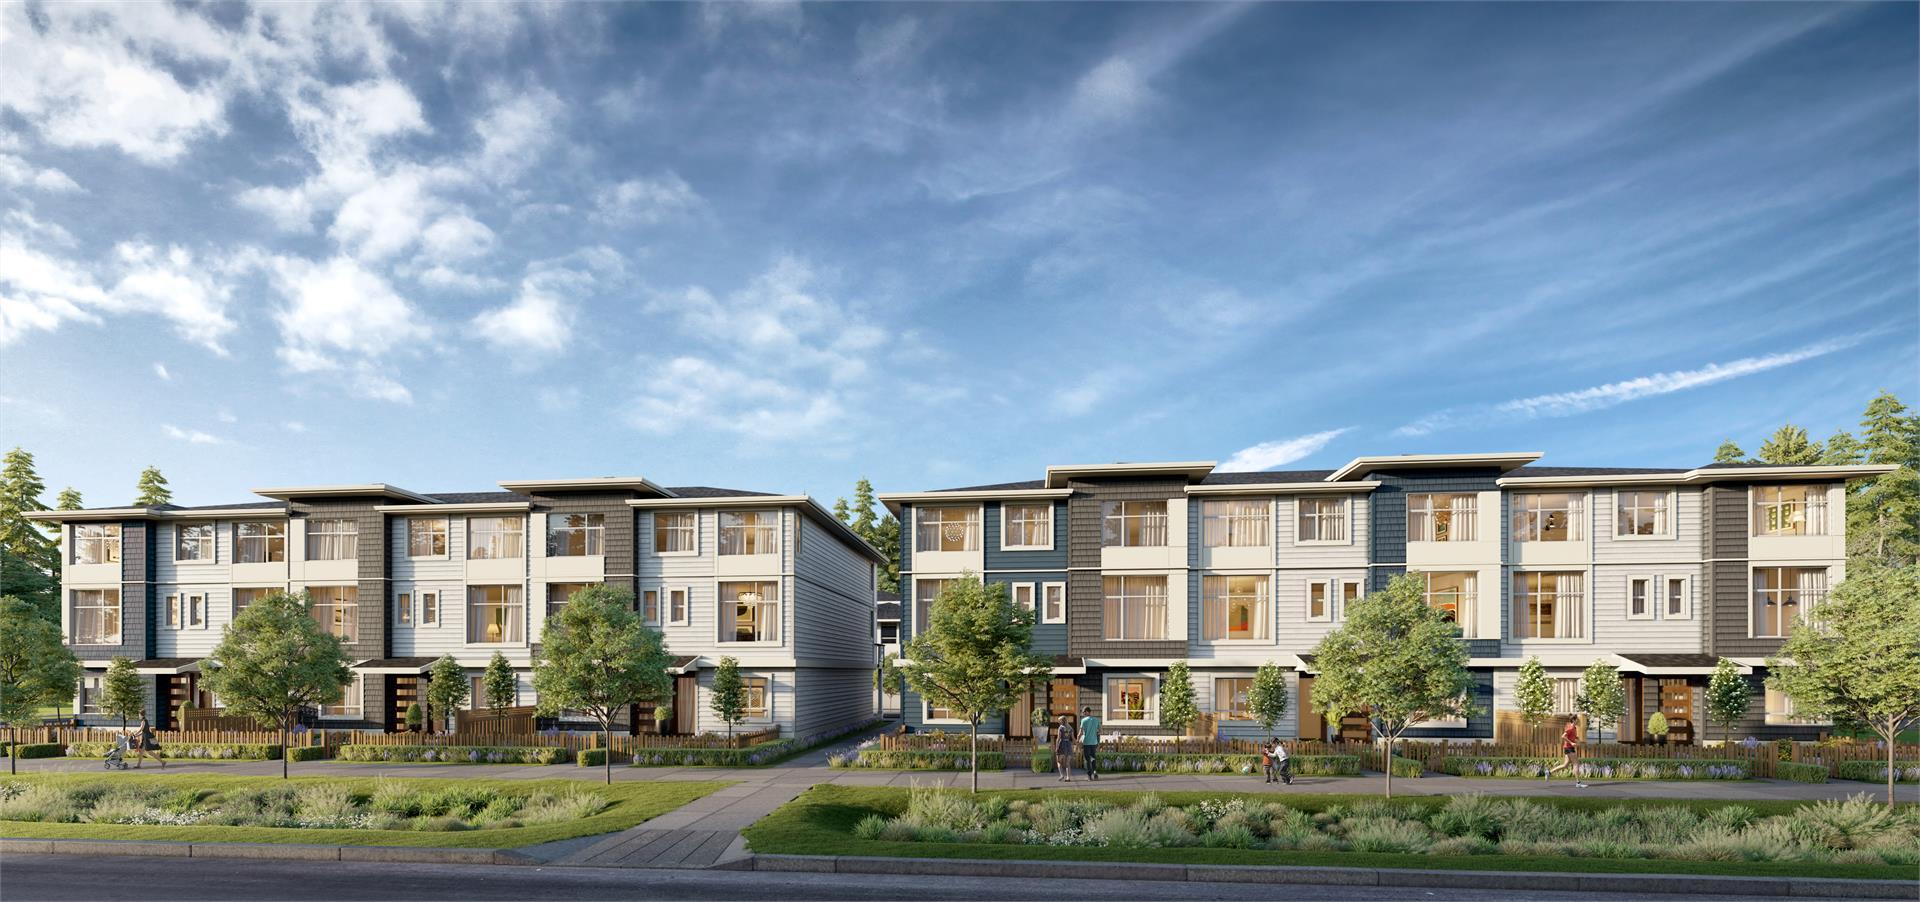 New Surrey Development Front View Of Townhouse Development